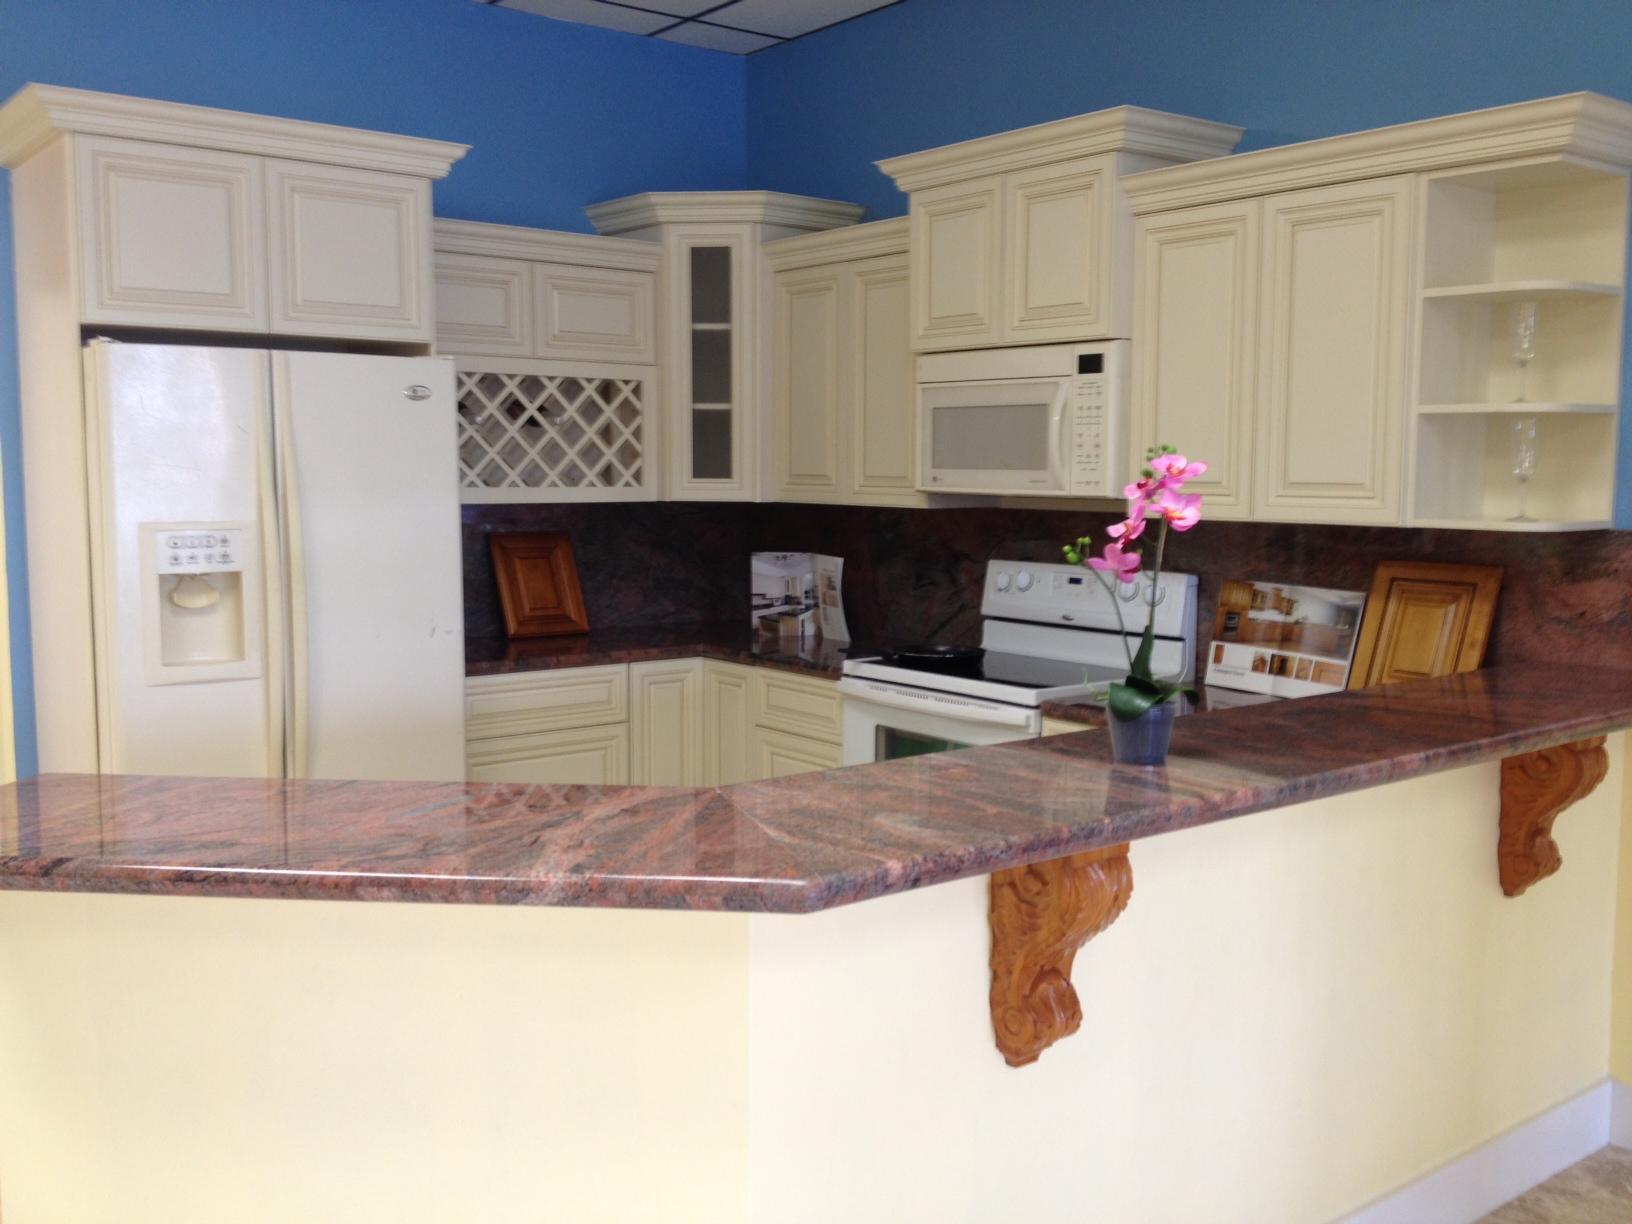 kitchen cabinetry wholesale kitchen cabinets Princeton White